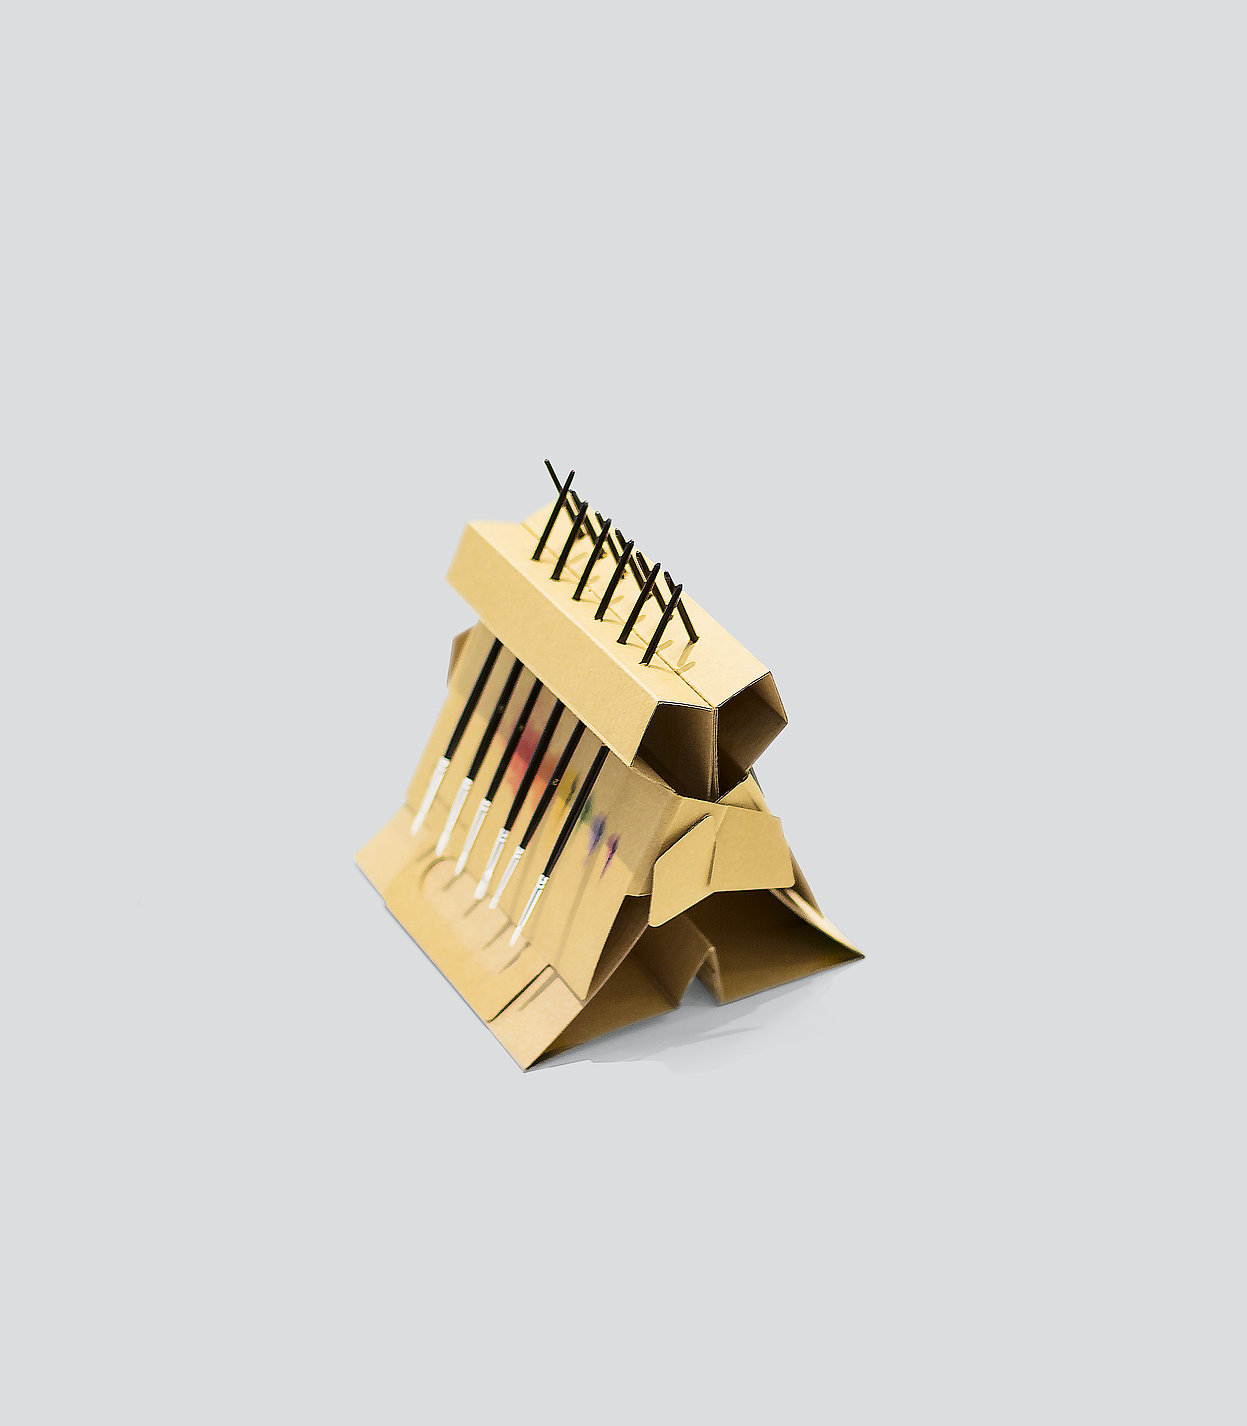 Eco Brush Box | Red Dot Design Award